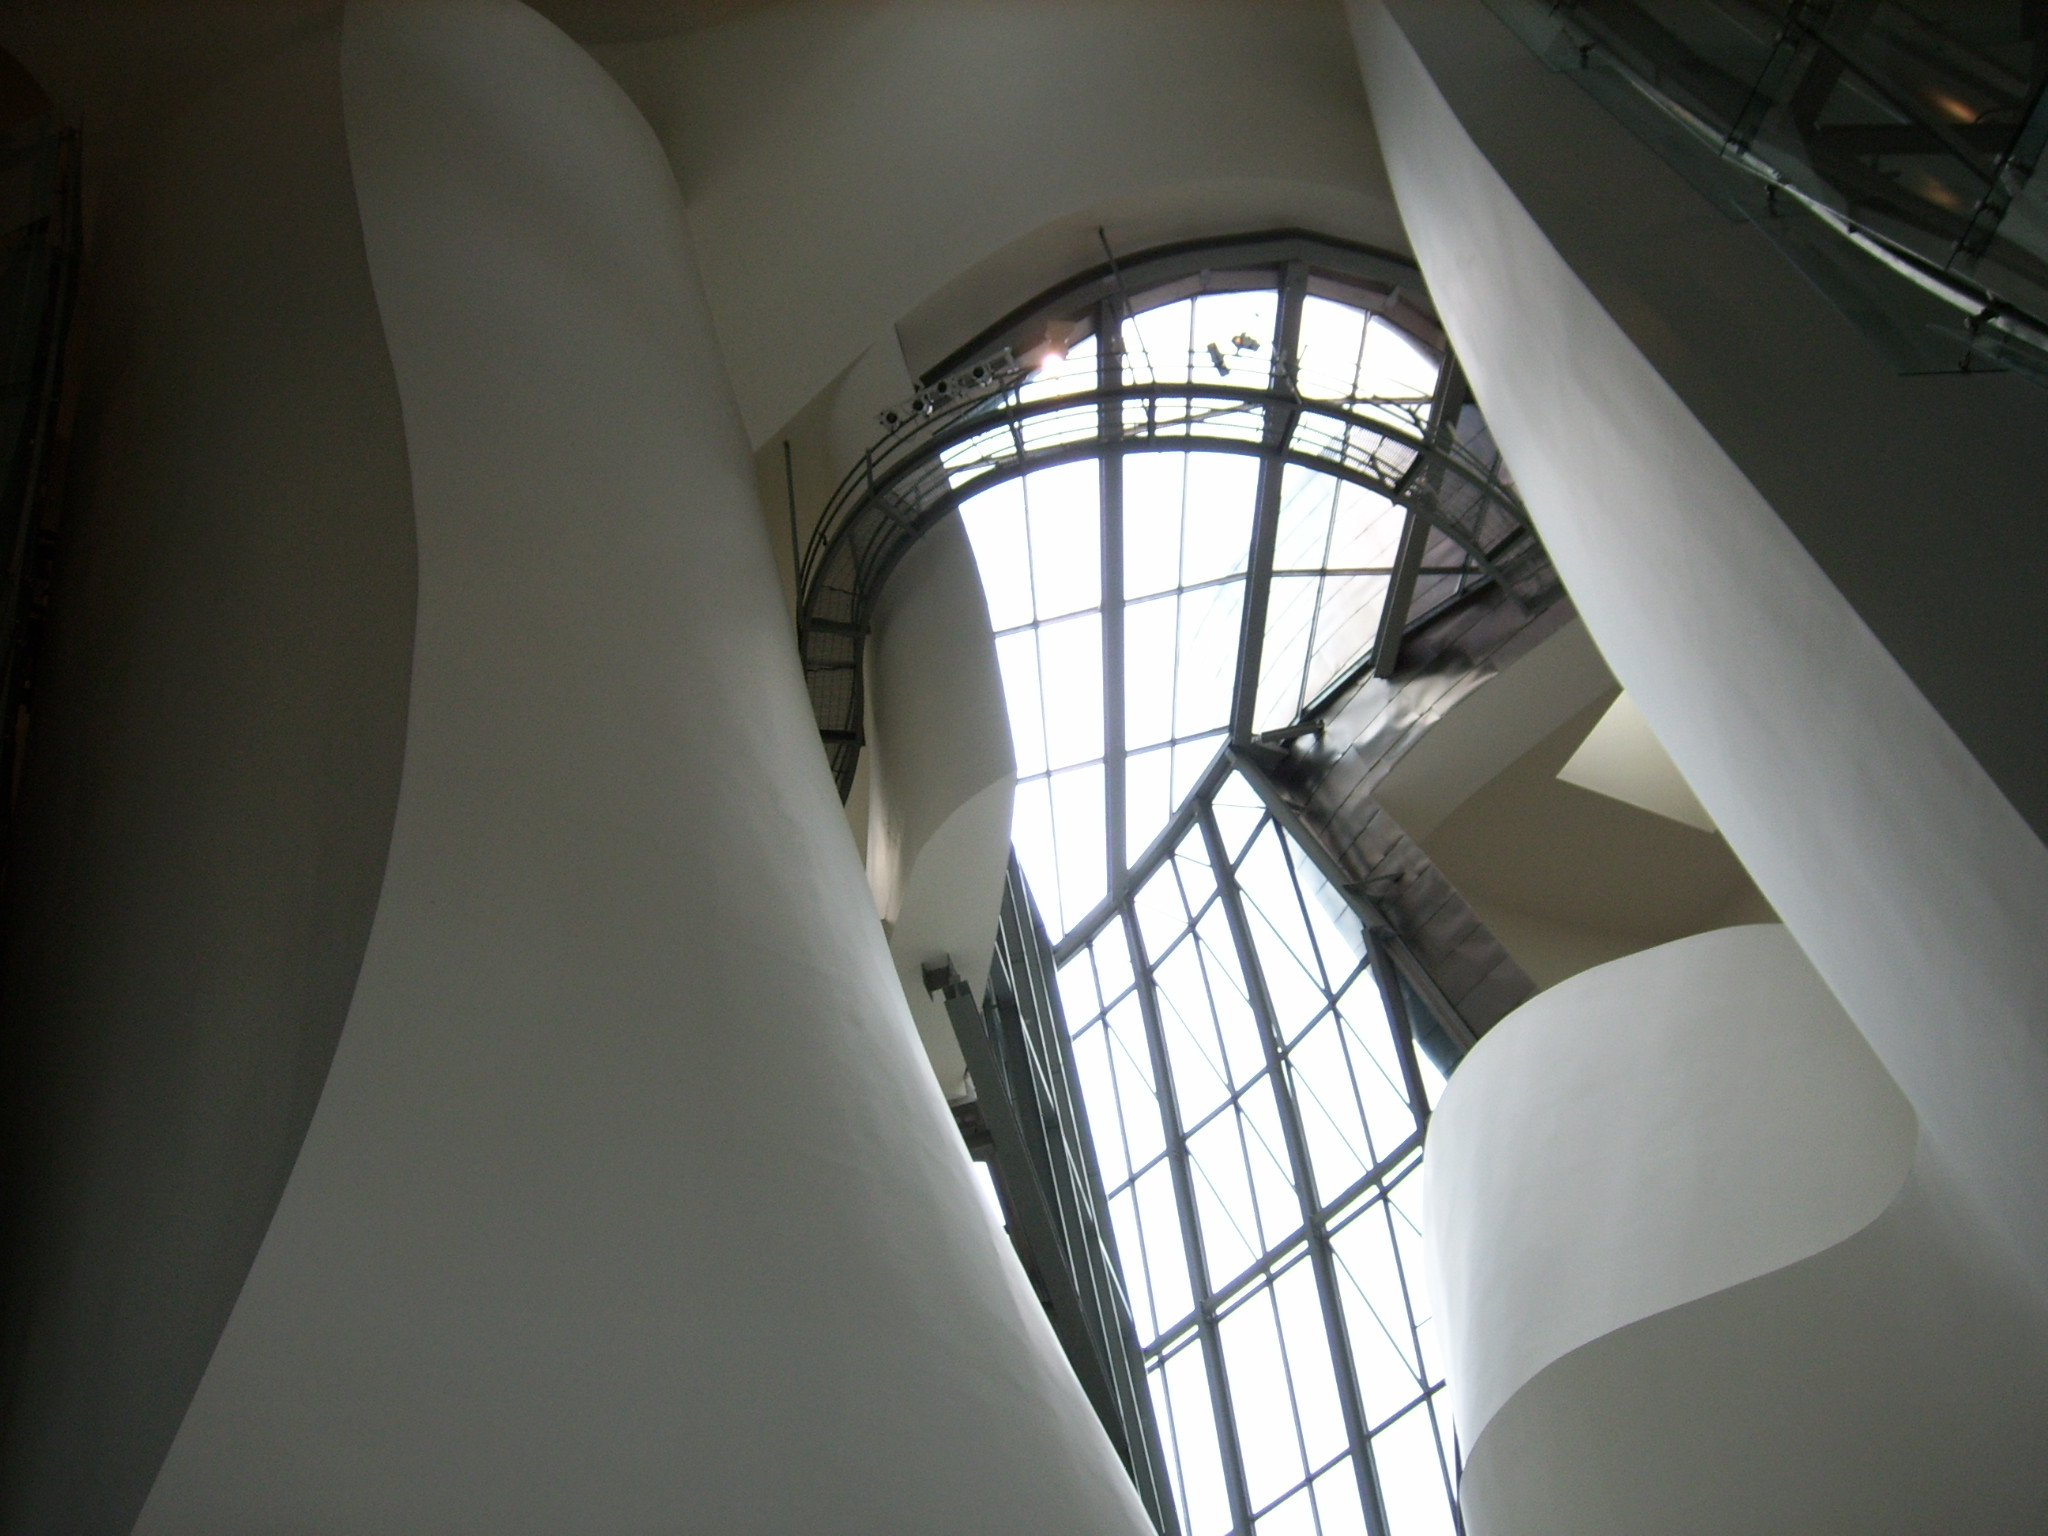 File:Guggenheim museum bilbau inside.jpg - Wikimedia Commons  Guggenheim Inside